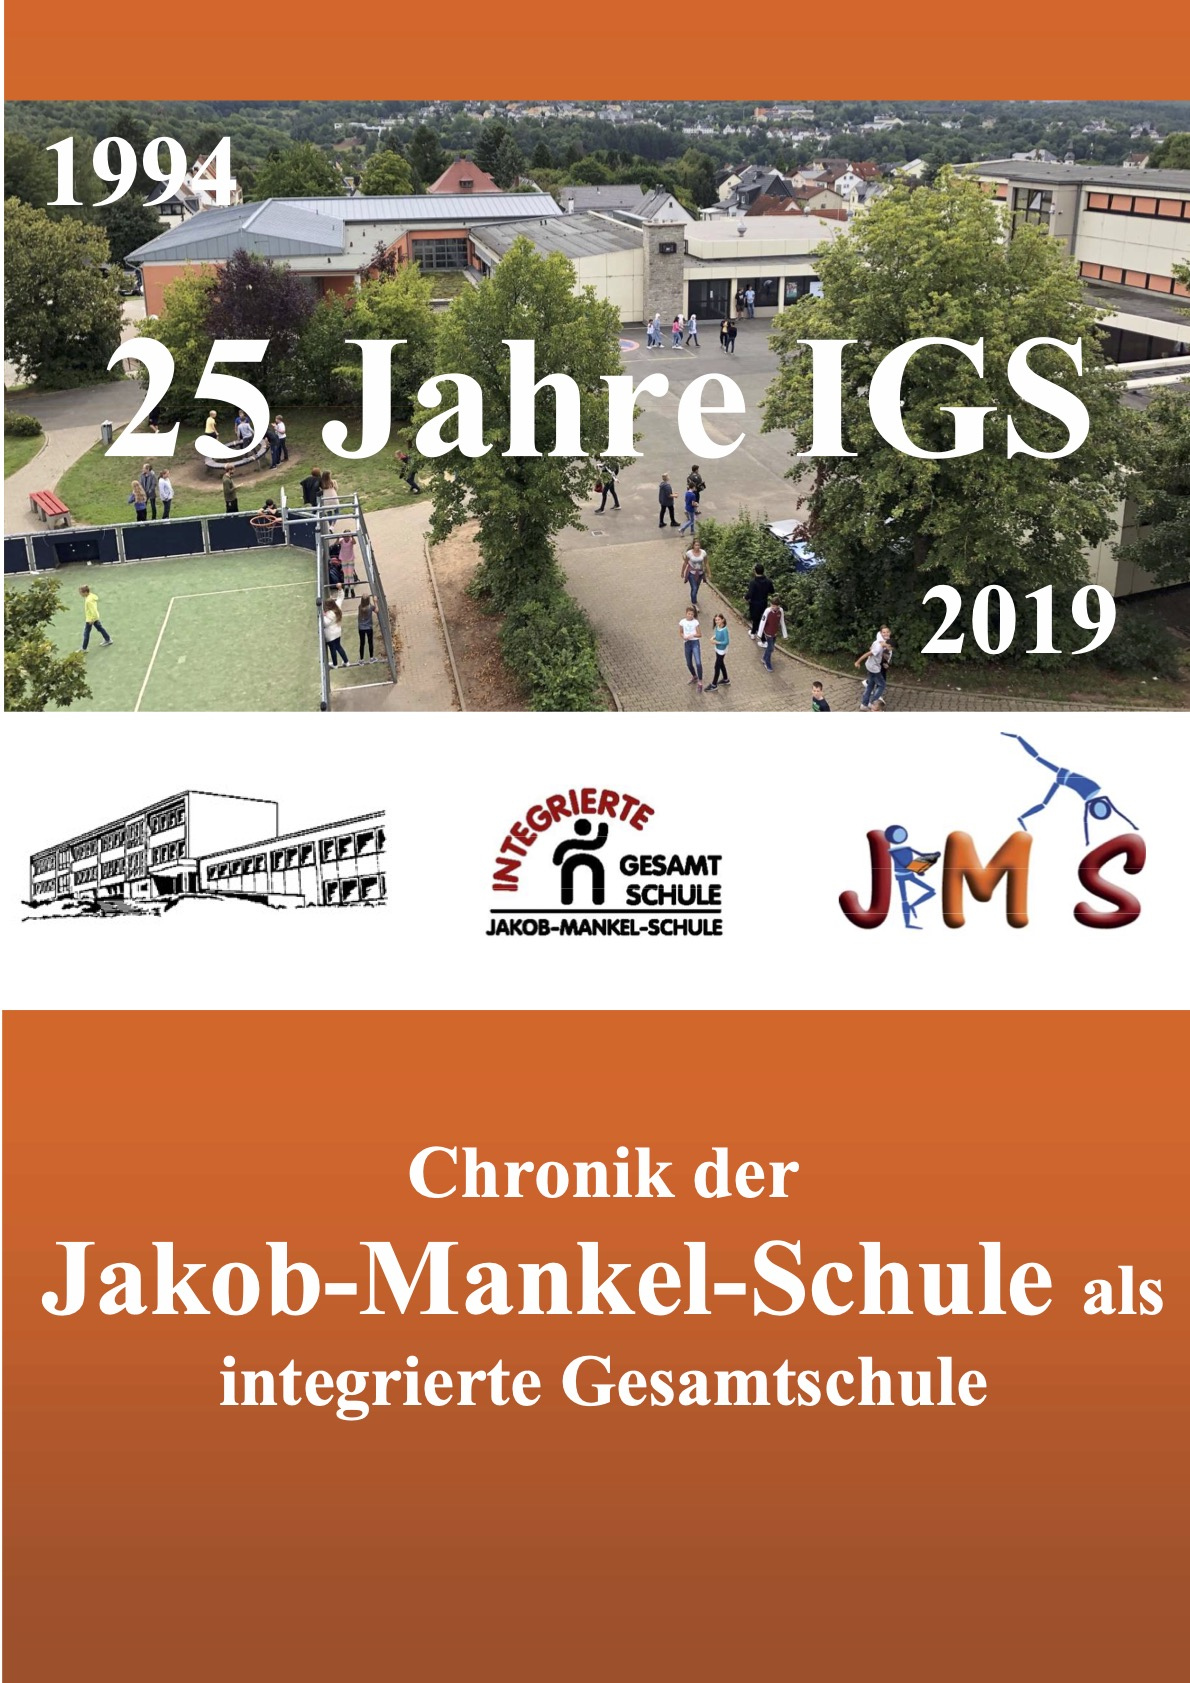 JMS CHRONIK